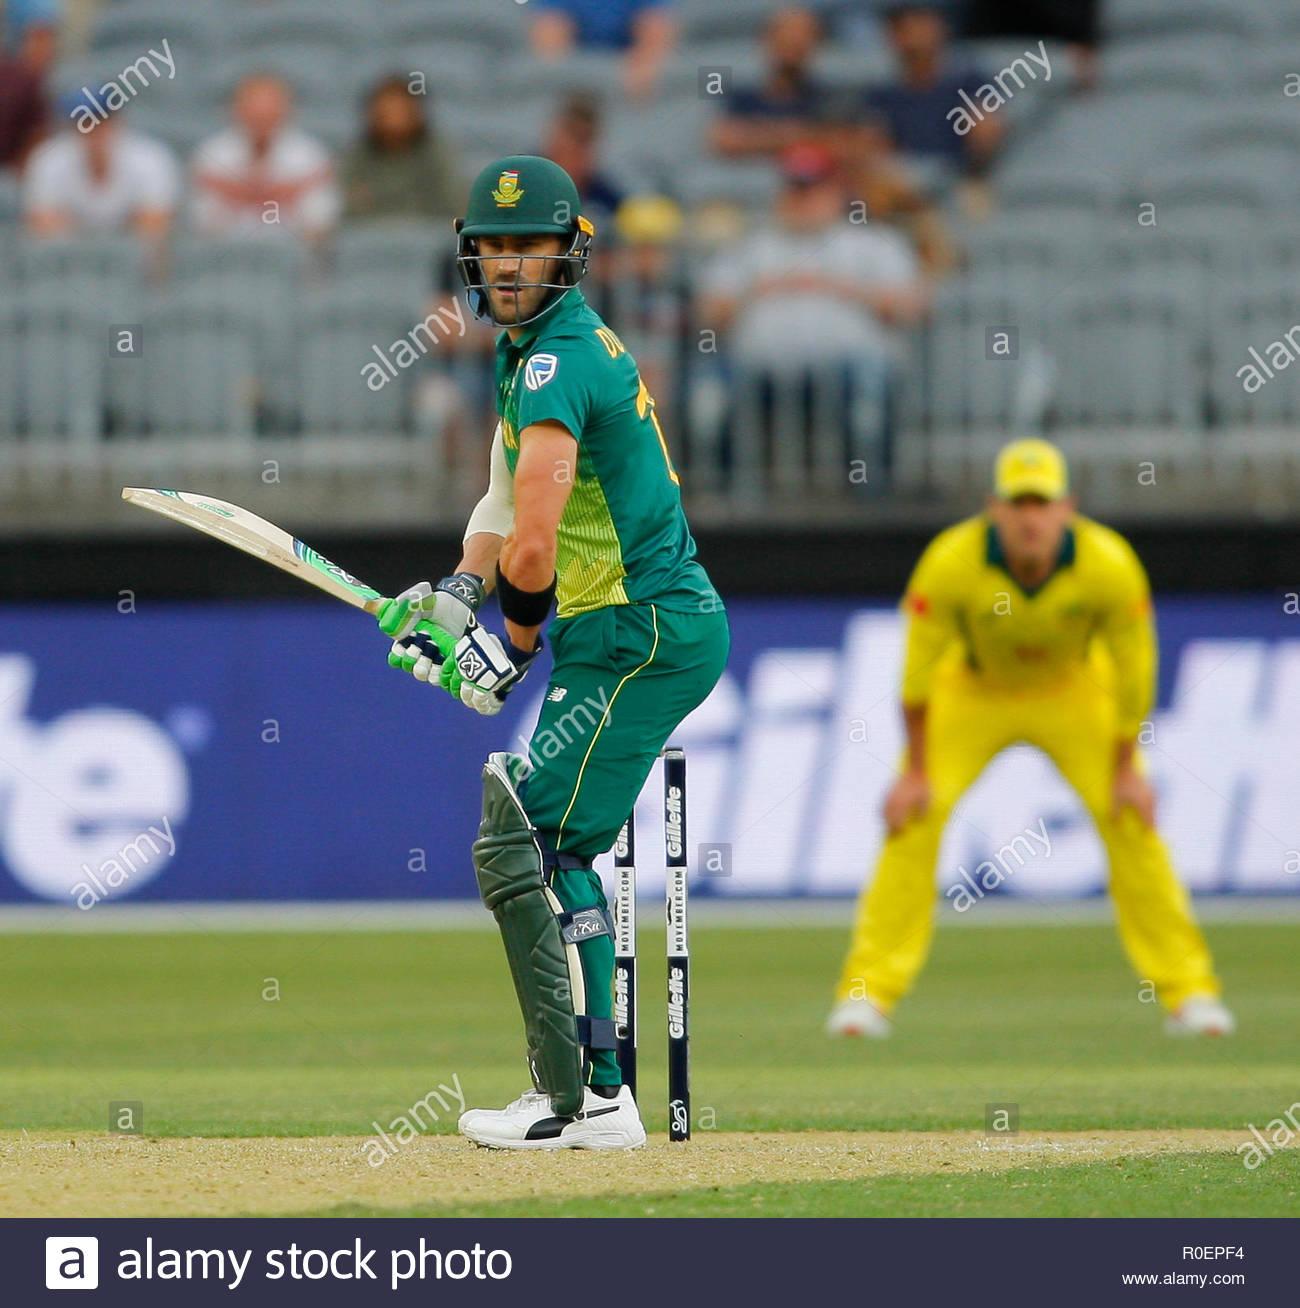 Faf Du Plessis Stock Photos Faf Du Plessis Stock Images   Alamy 1300x1308